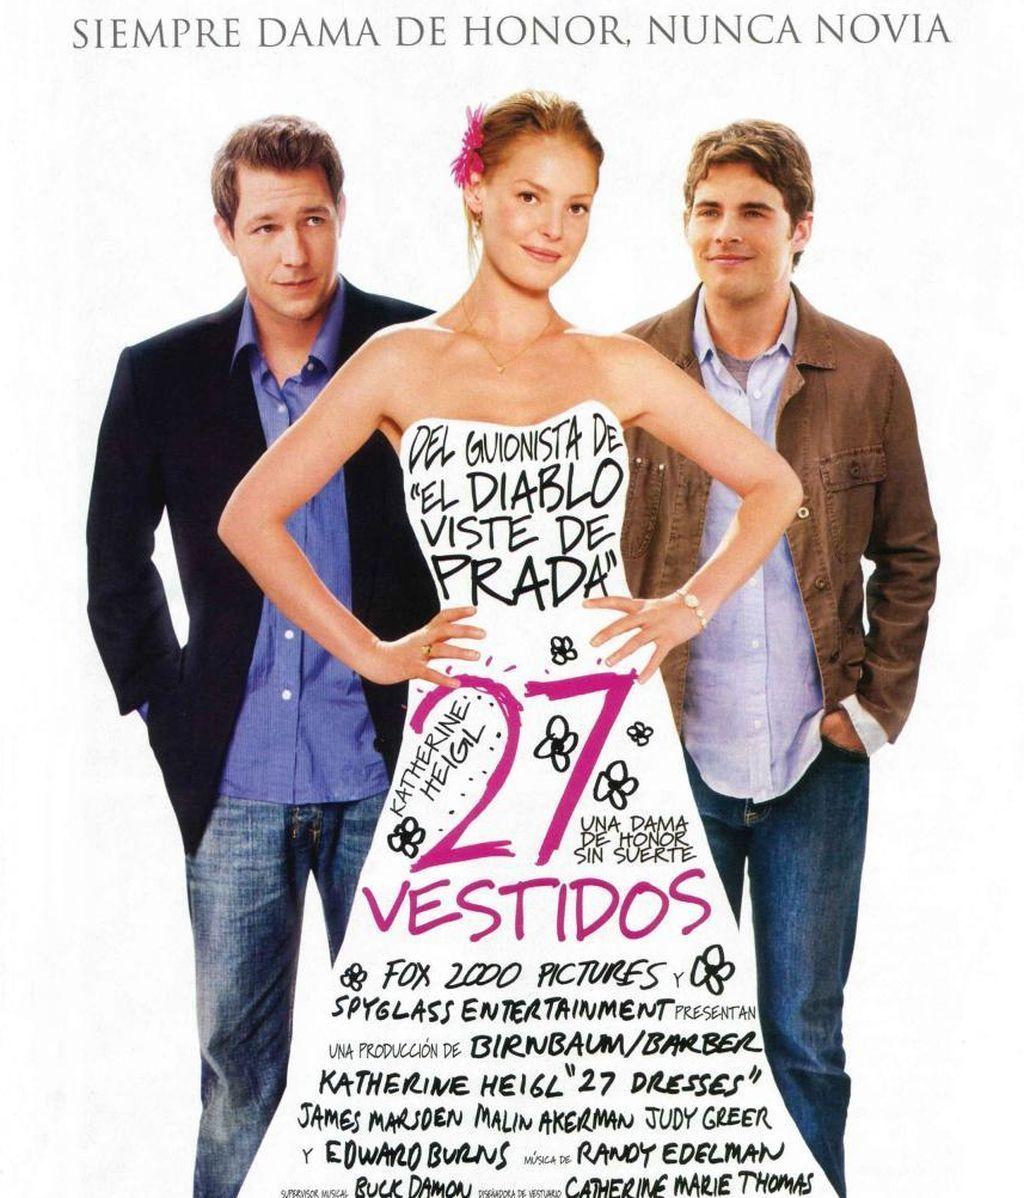 12_27_vestidos-658920027-large